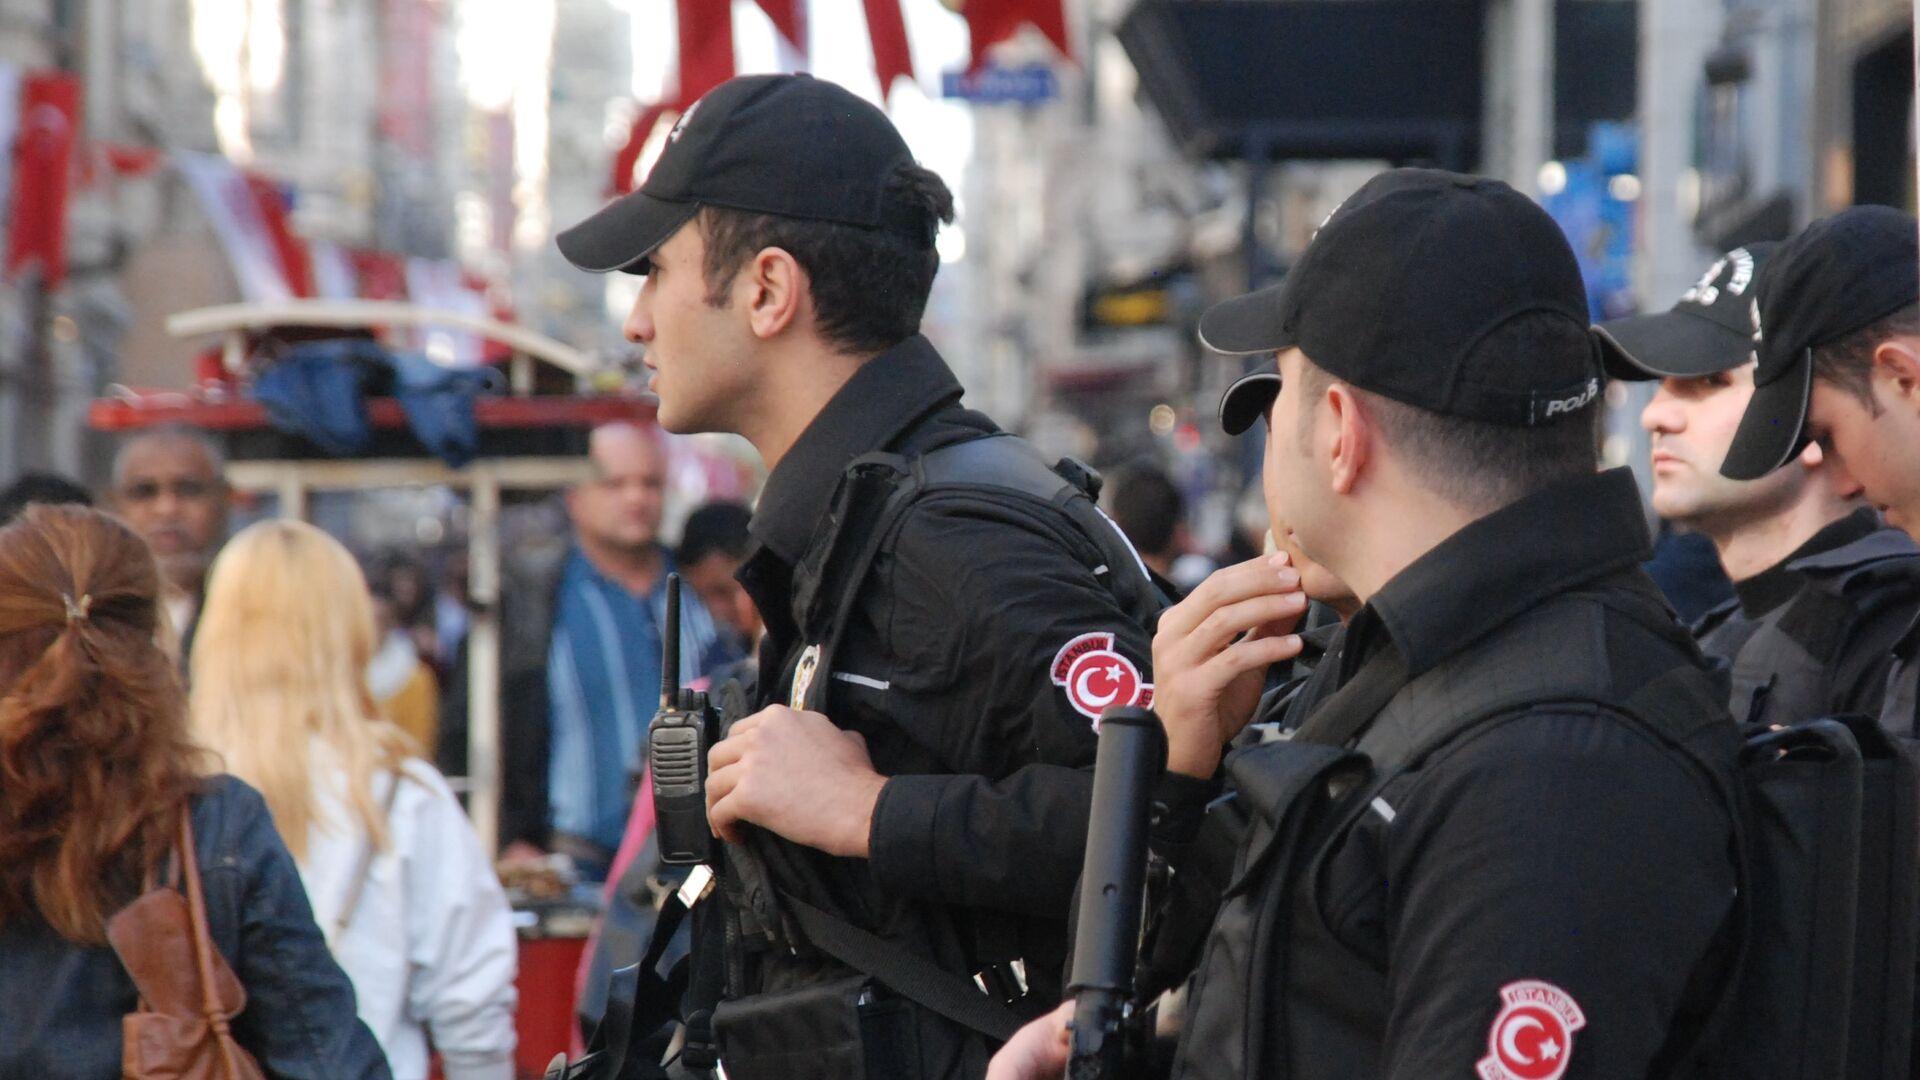 Полиция на улице Стамбула - РИА Новости, 1920, 04.12.2020